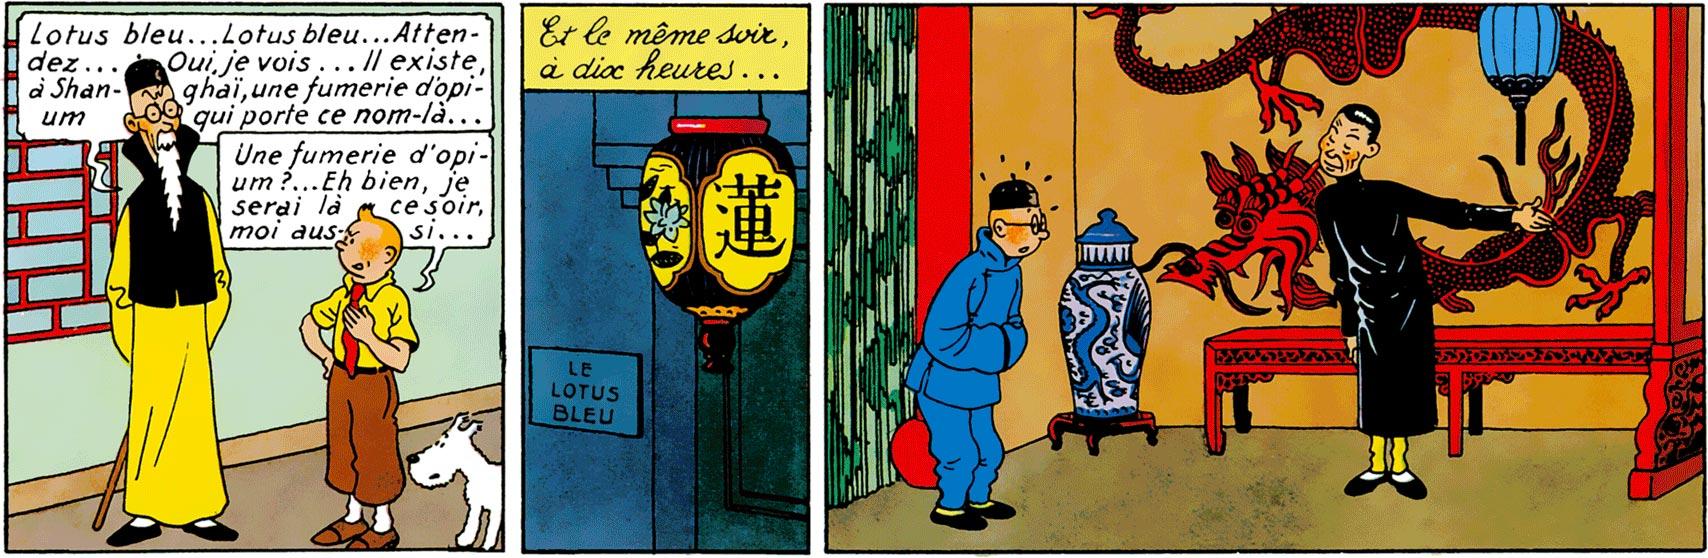 Le Lotus bleu Tintin en costume bleu